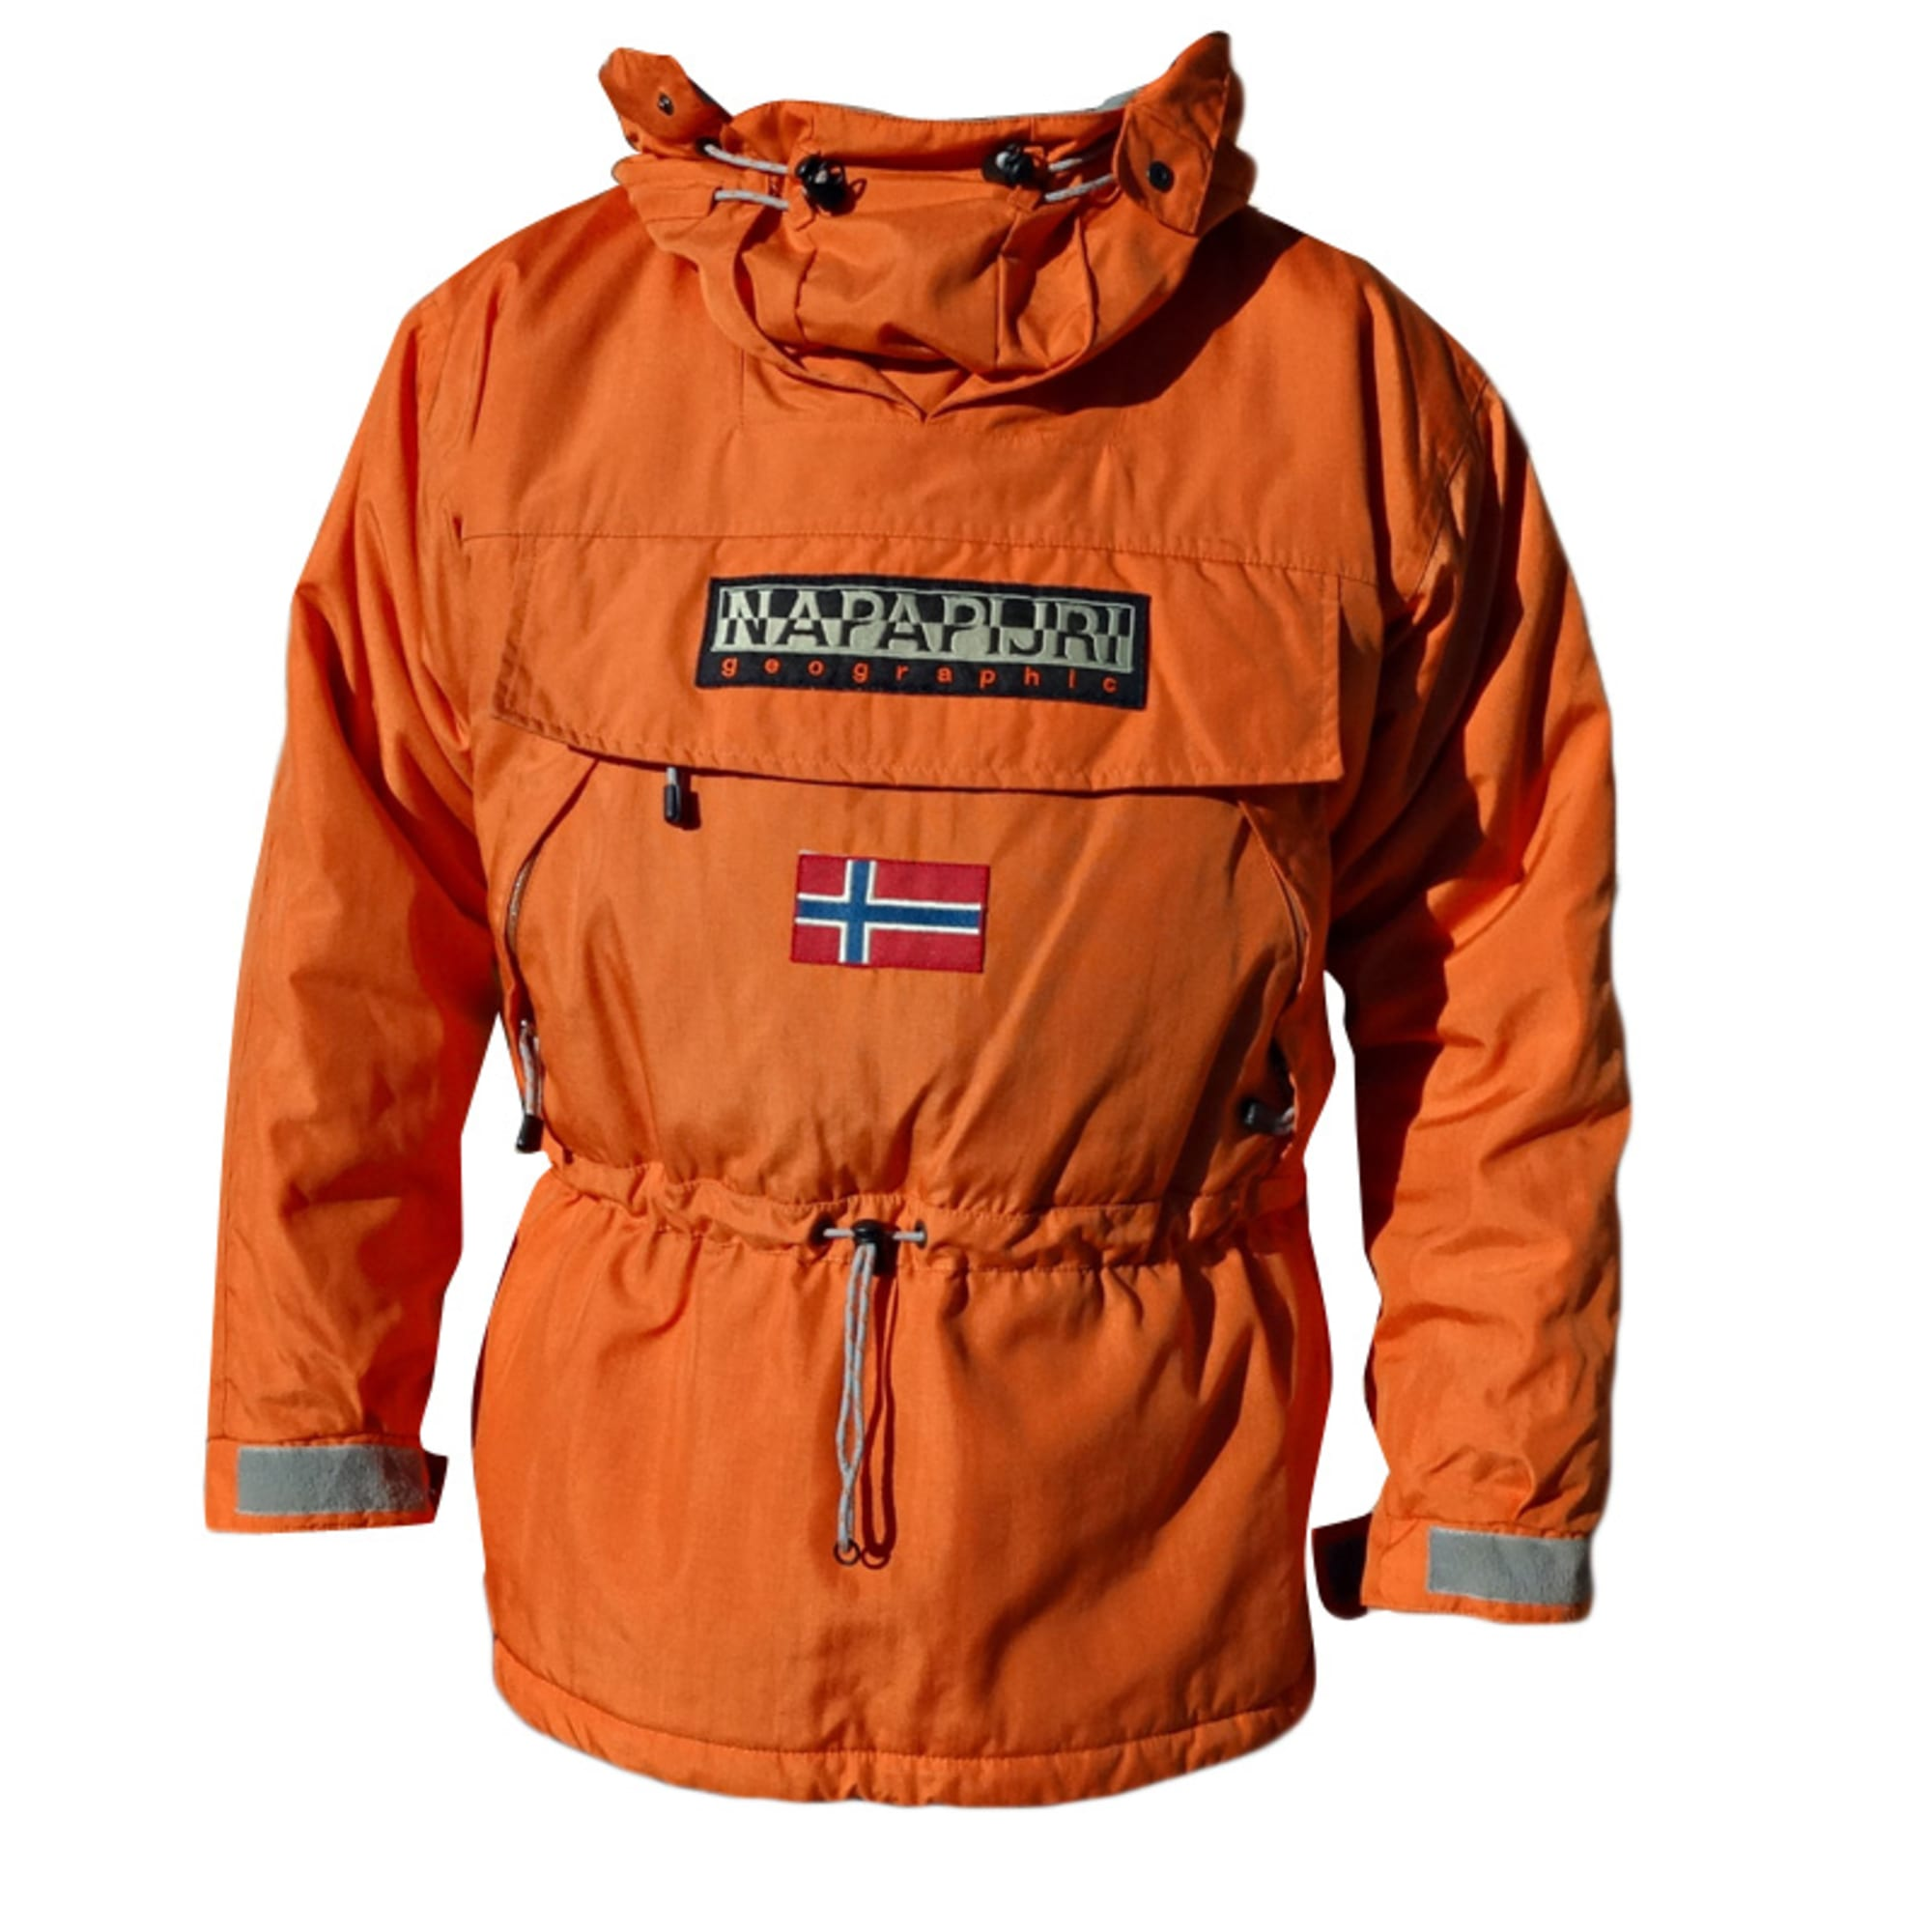 50 50 Par Blouson Ski Ski Ski Orange Shopname809727 Vendu m De Napapijri CCqTP